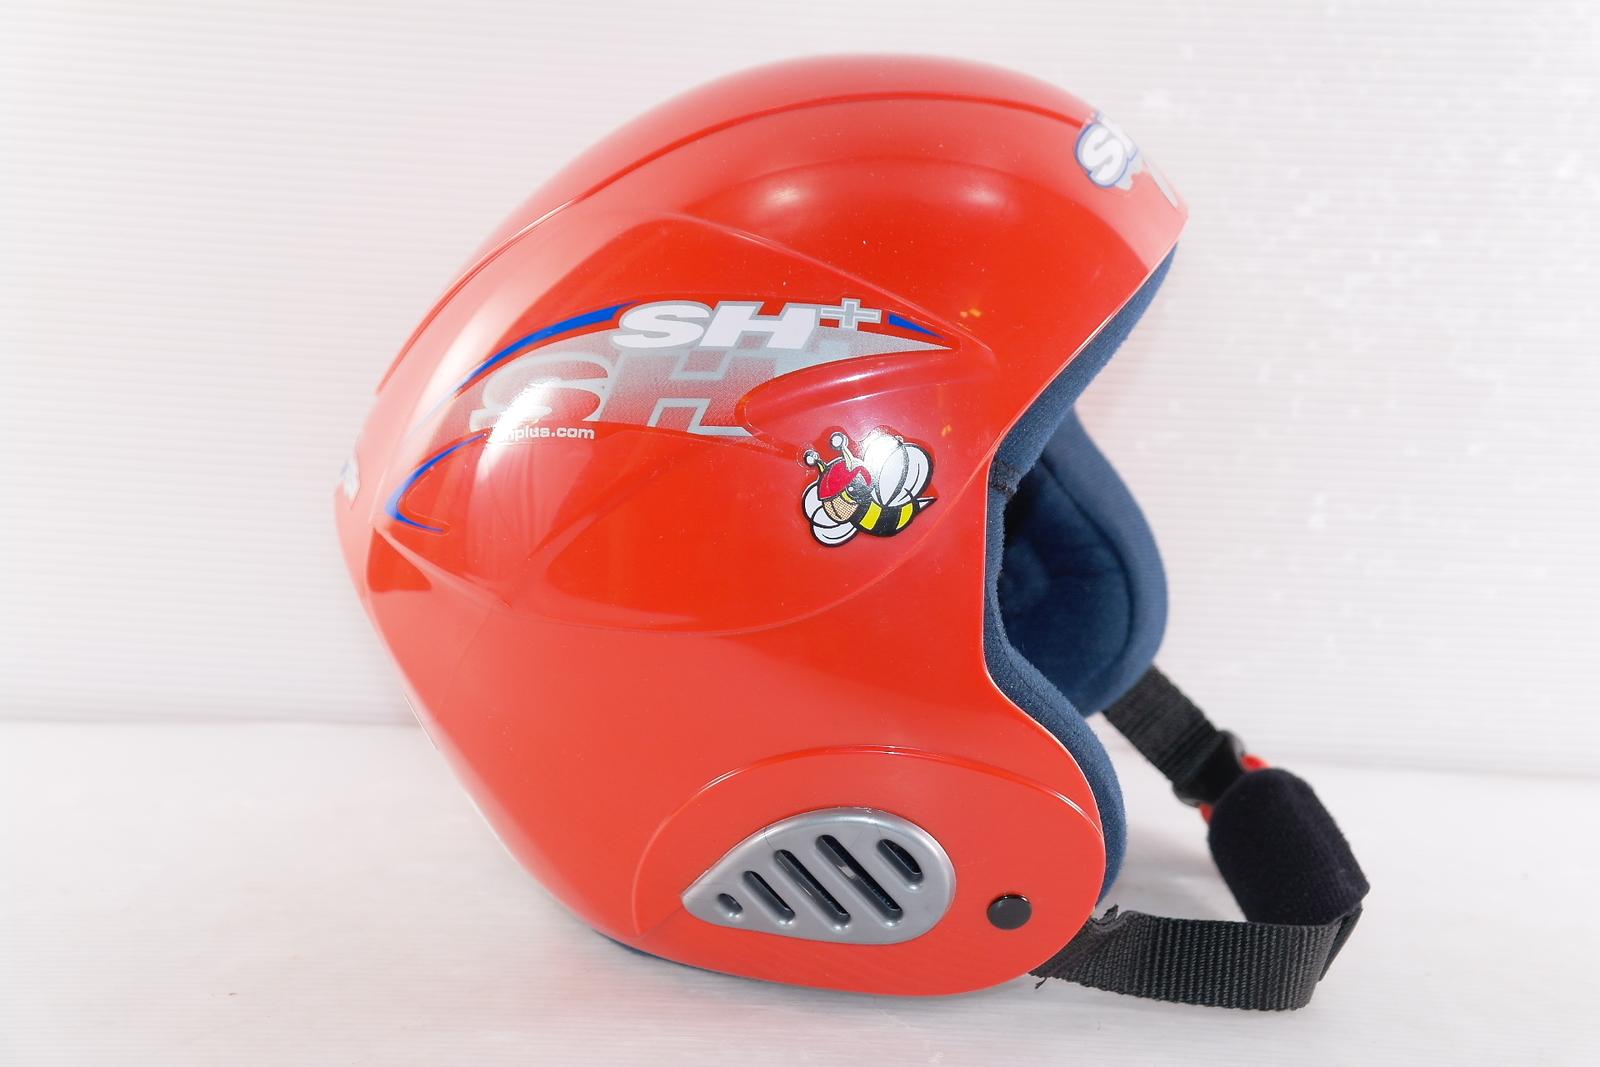 Dětská lyžařská helma SH+ EX1 EVO III vel. 52